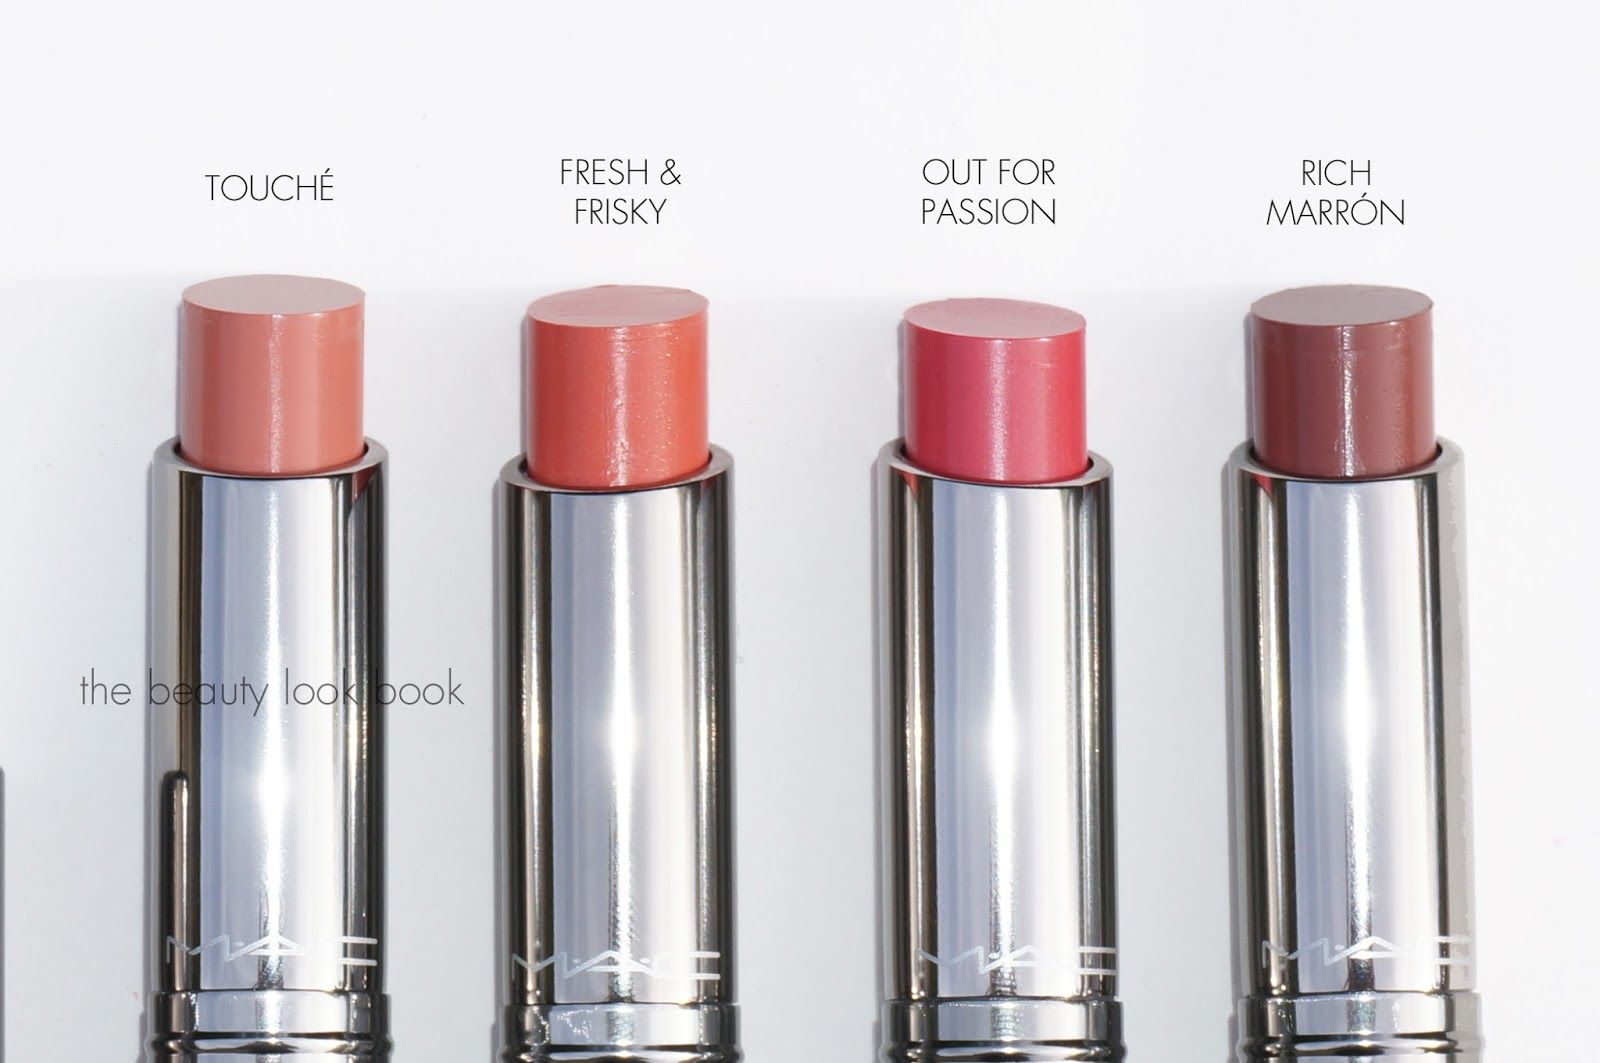 MAC Huggable Lip Colour: Touché, Fresh